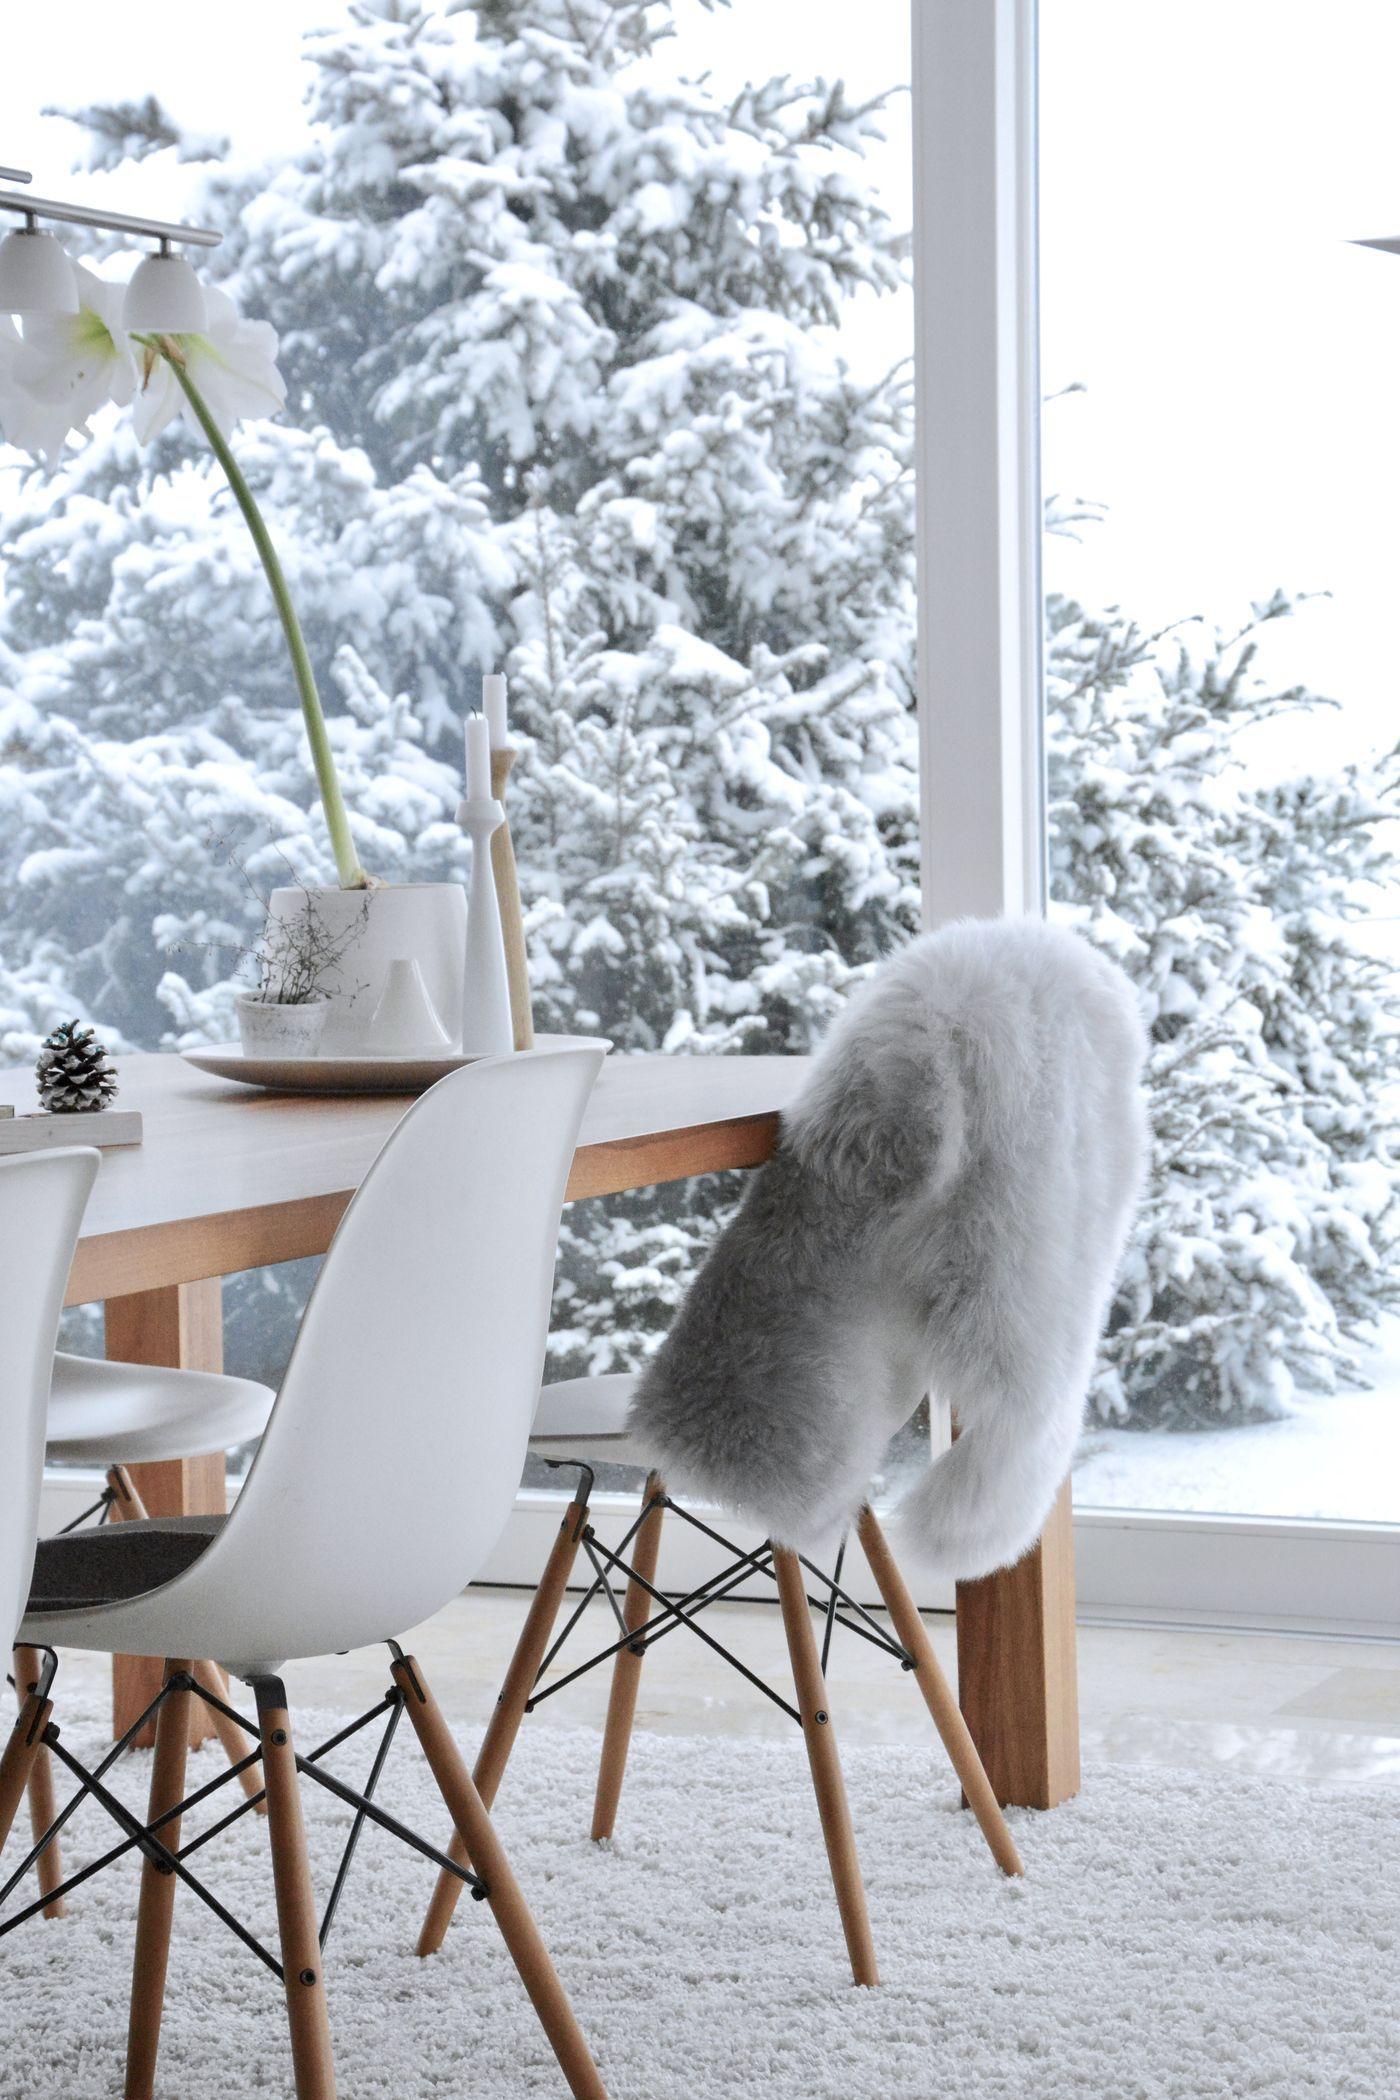 Winterdeko Ideen & Bilder